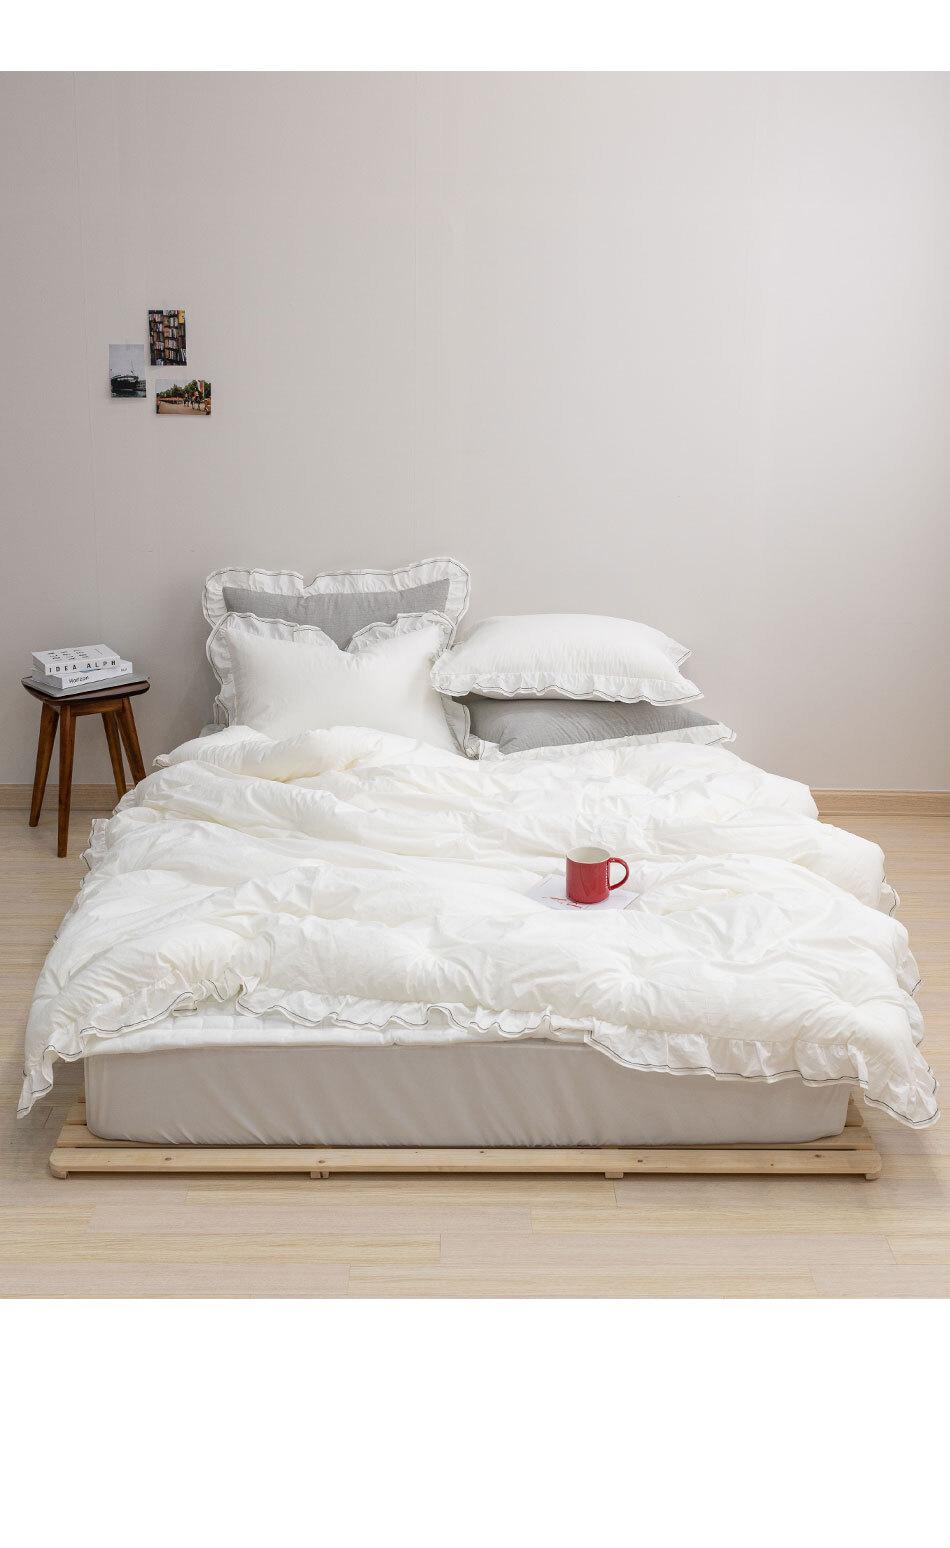 stay_bed_white5.jpg